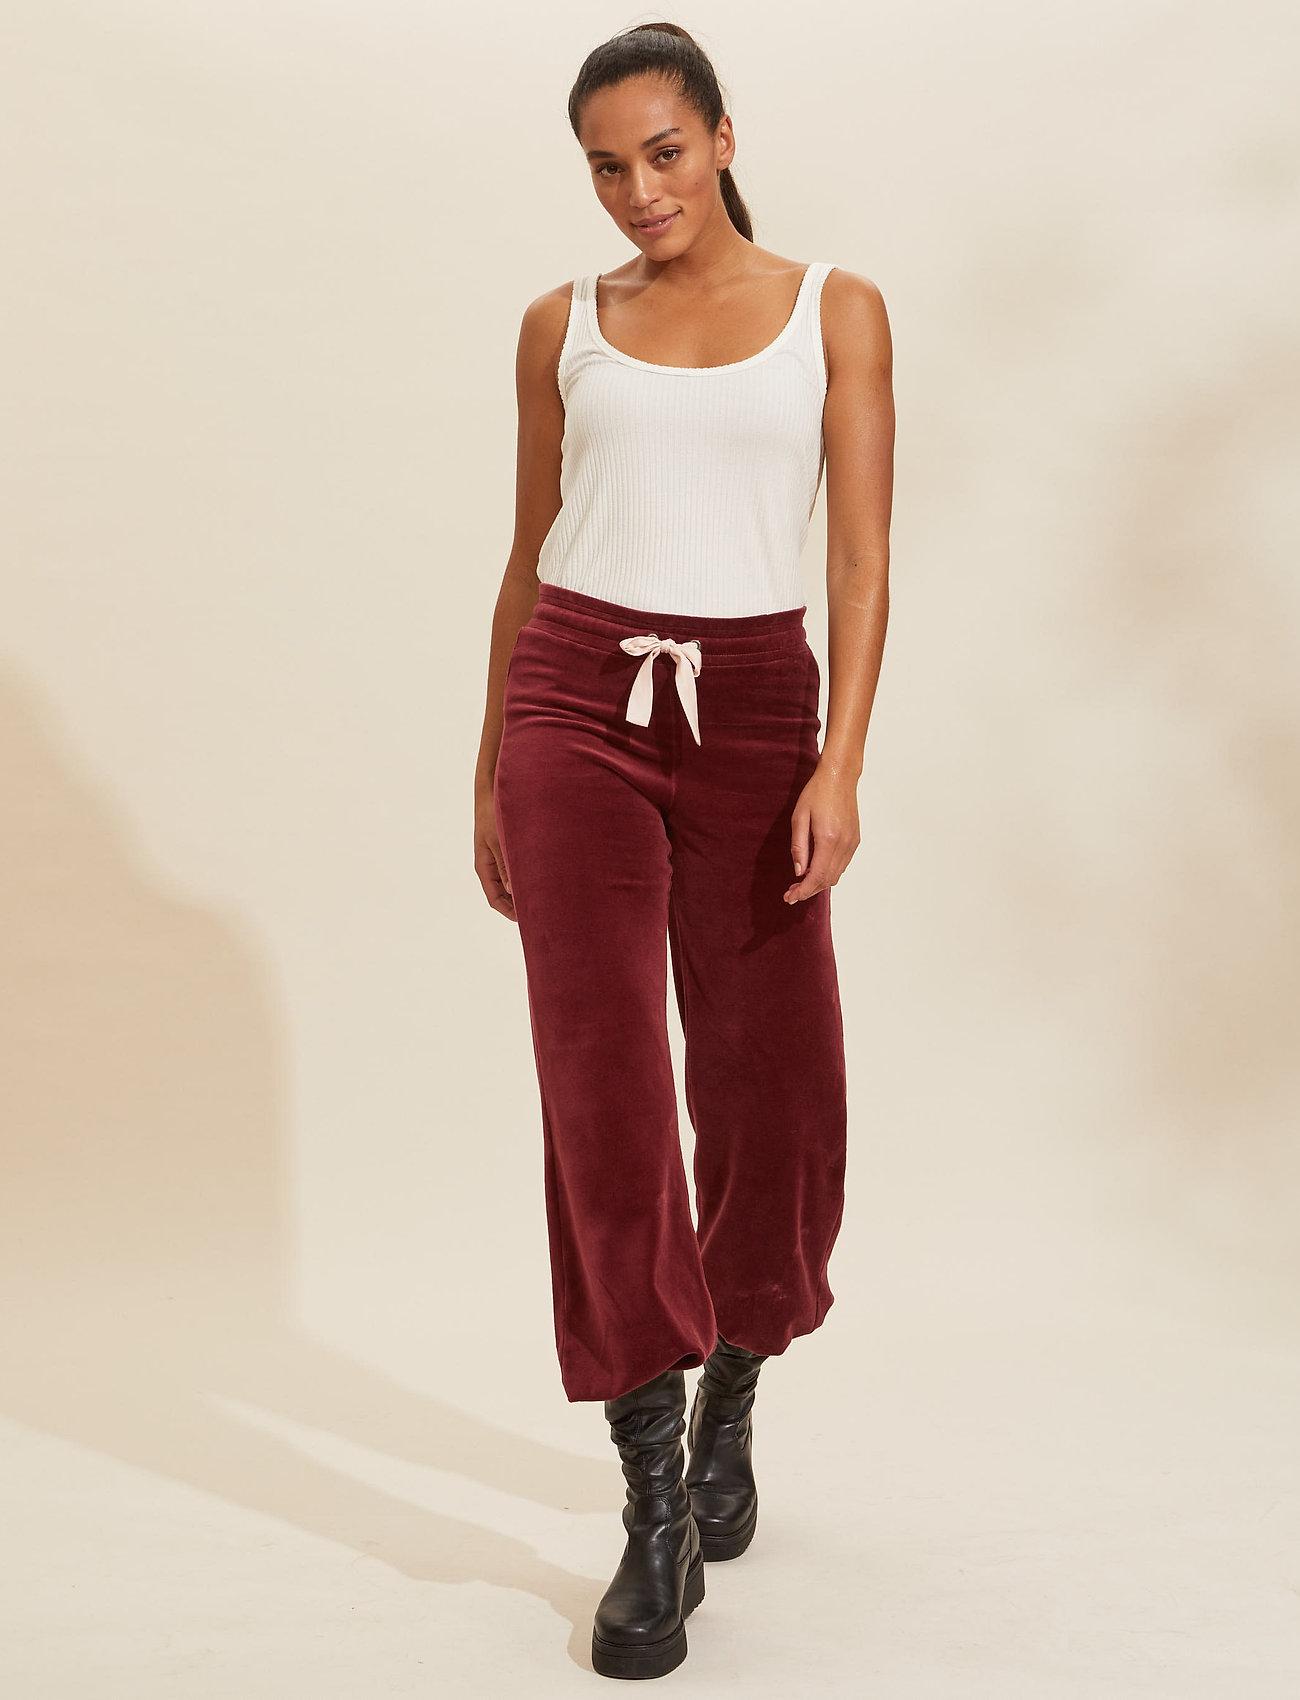 ODD MOLLY - Marion Pants - sweatpants - baked burgundy - 0